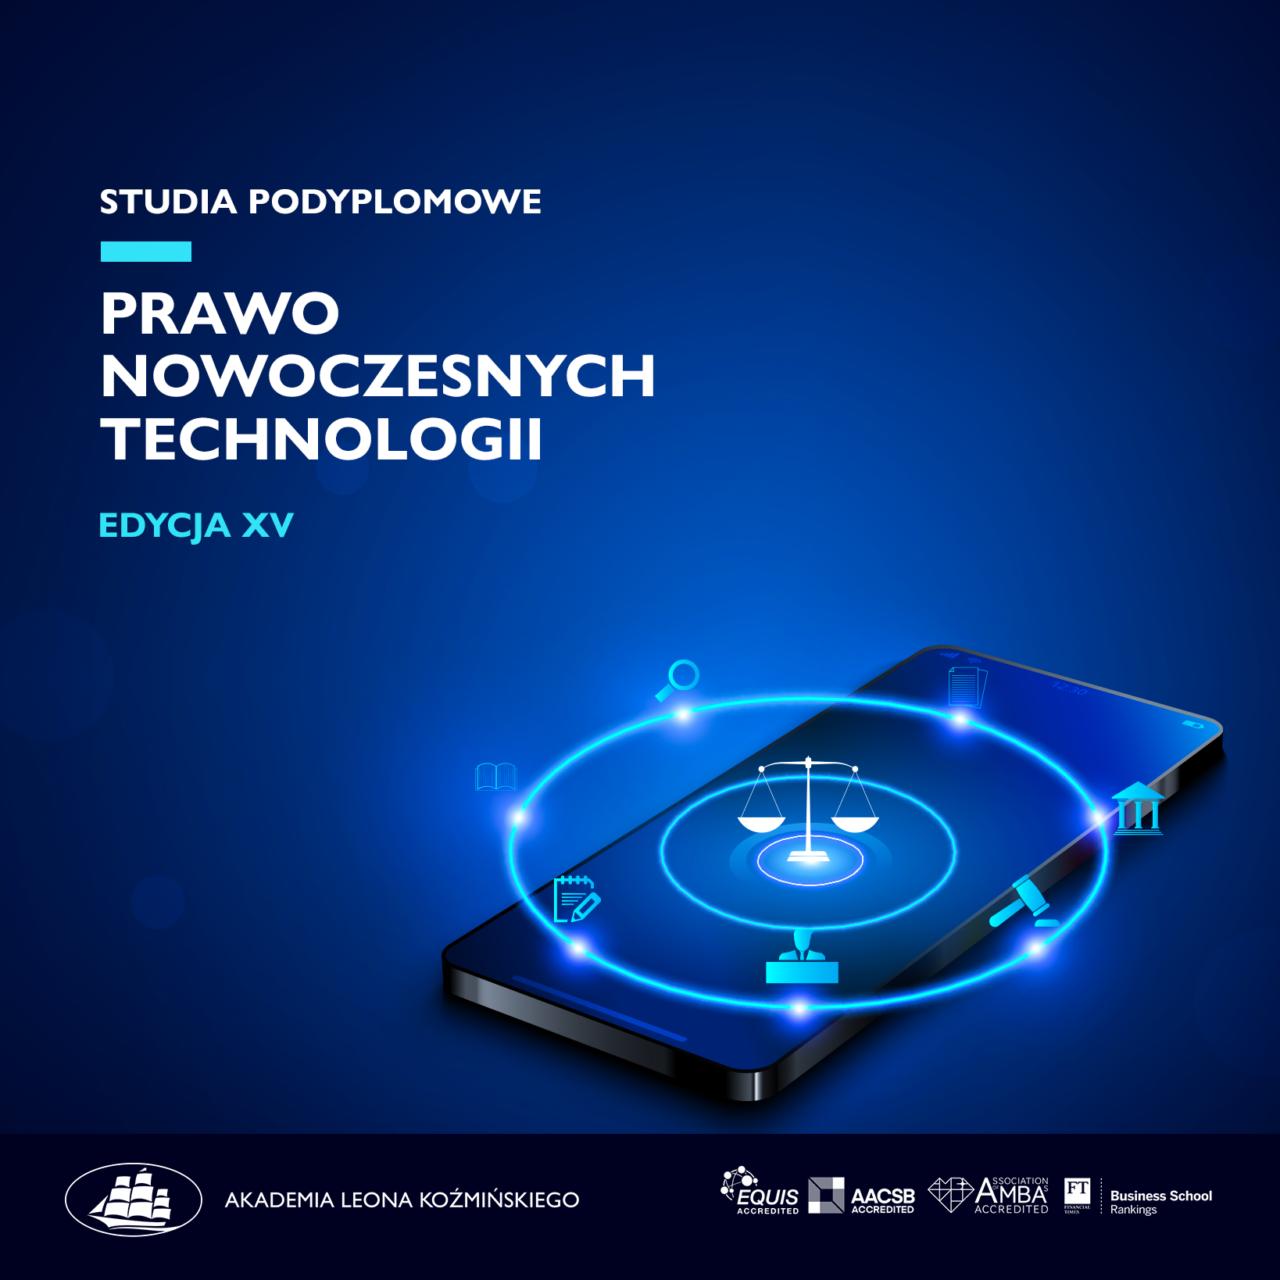 https://ailawtech.org/wp-content/uploads/2021/07/prawo-nowoczesnych-mediow-promo-1280x1280.png